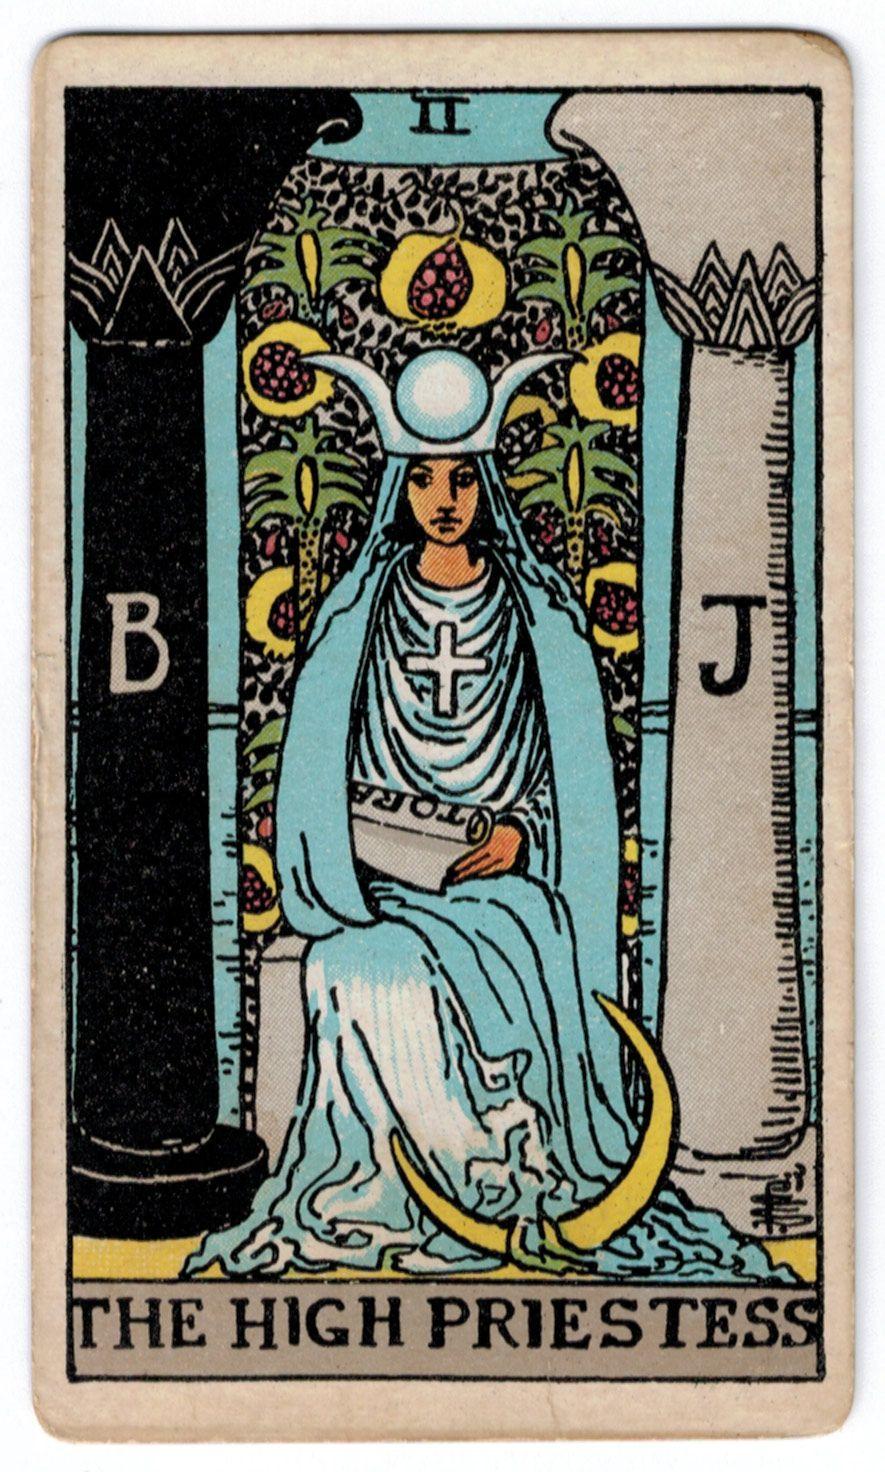 Rider Waite Tarot Cards Set Of 78 Cards By Patriciadmdesigns: Atu 2 - The High Priestess